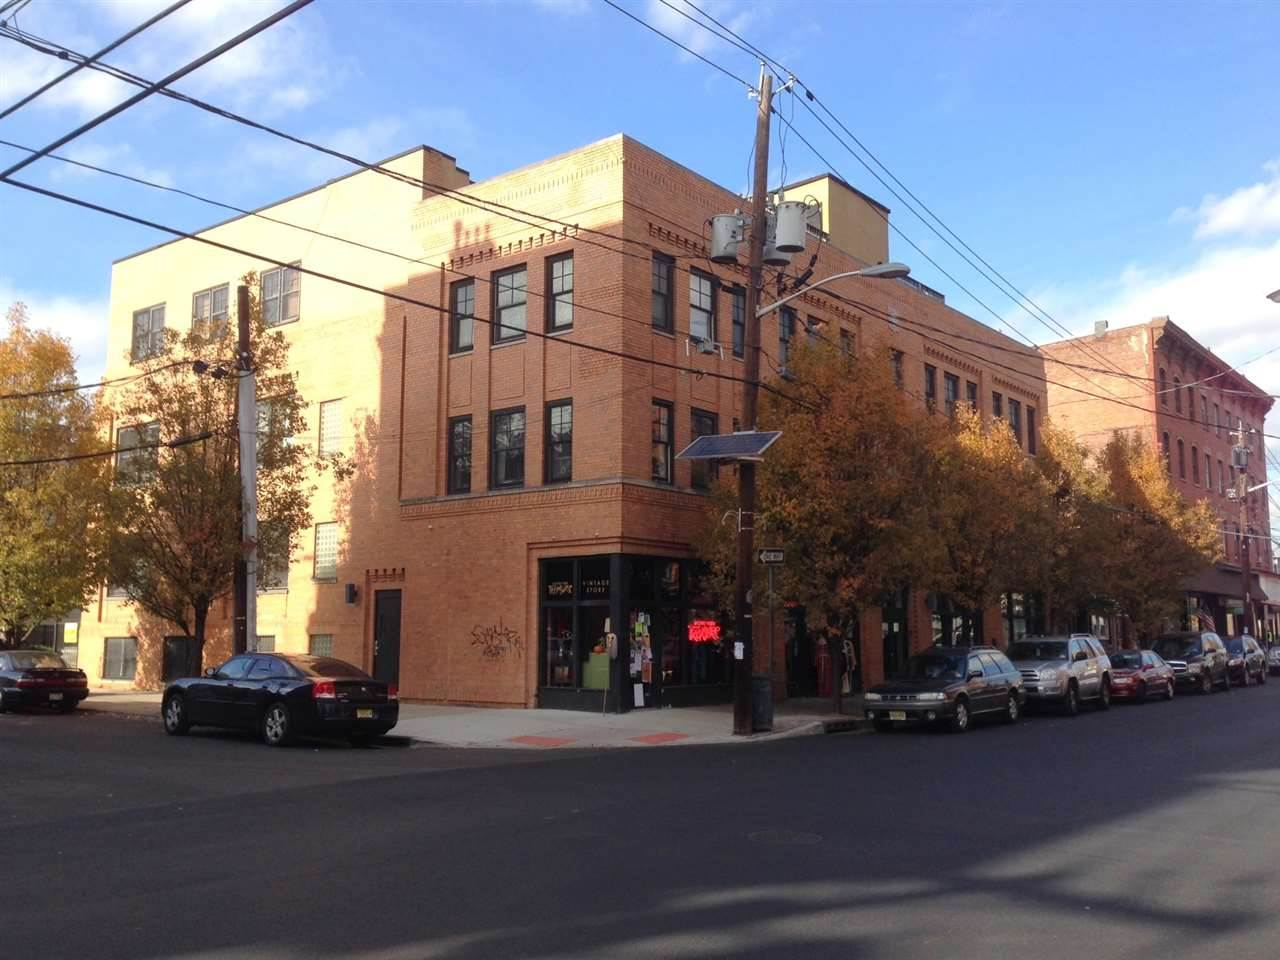 353 GROVE ST 4A, JC, Downtown, NJ 07302